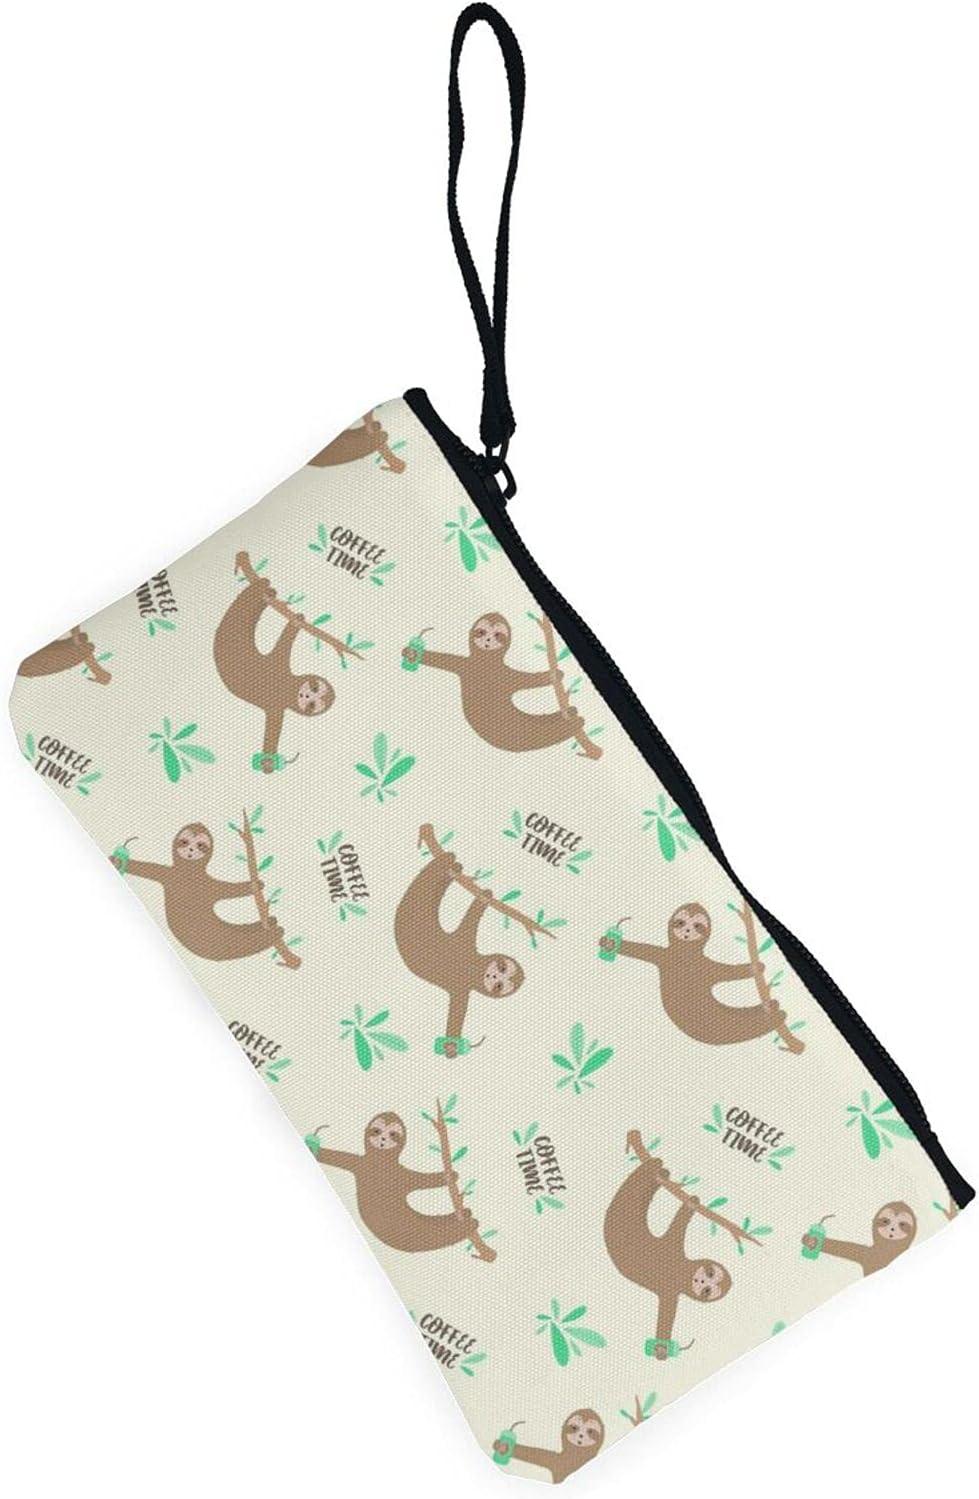 AORRUAM Cute Sloth Canvas Coin Purse,Canvas Zipper Pencil Cases,Canvas Change Purse Pouch Mini Wallet Coin Bag